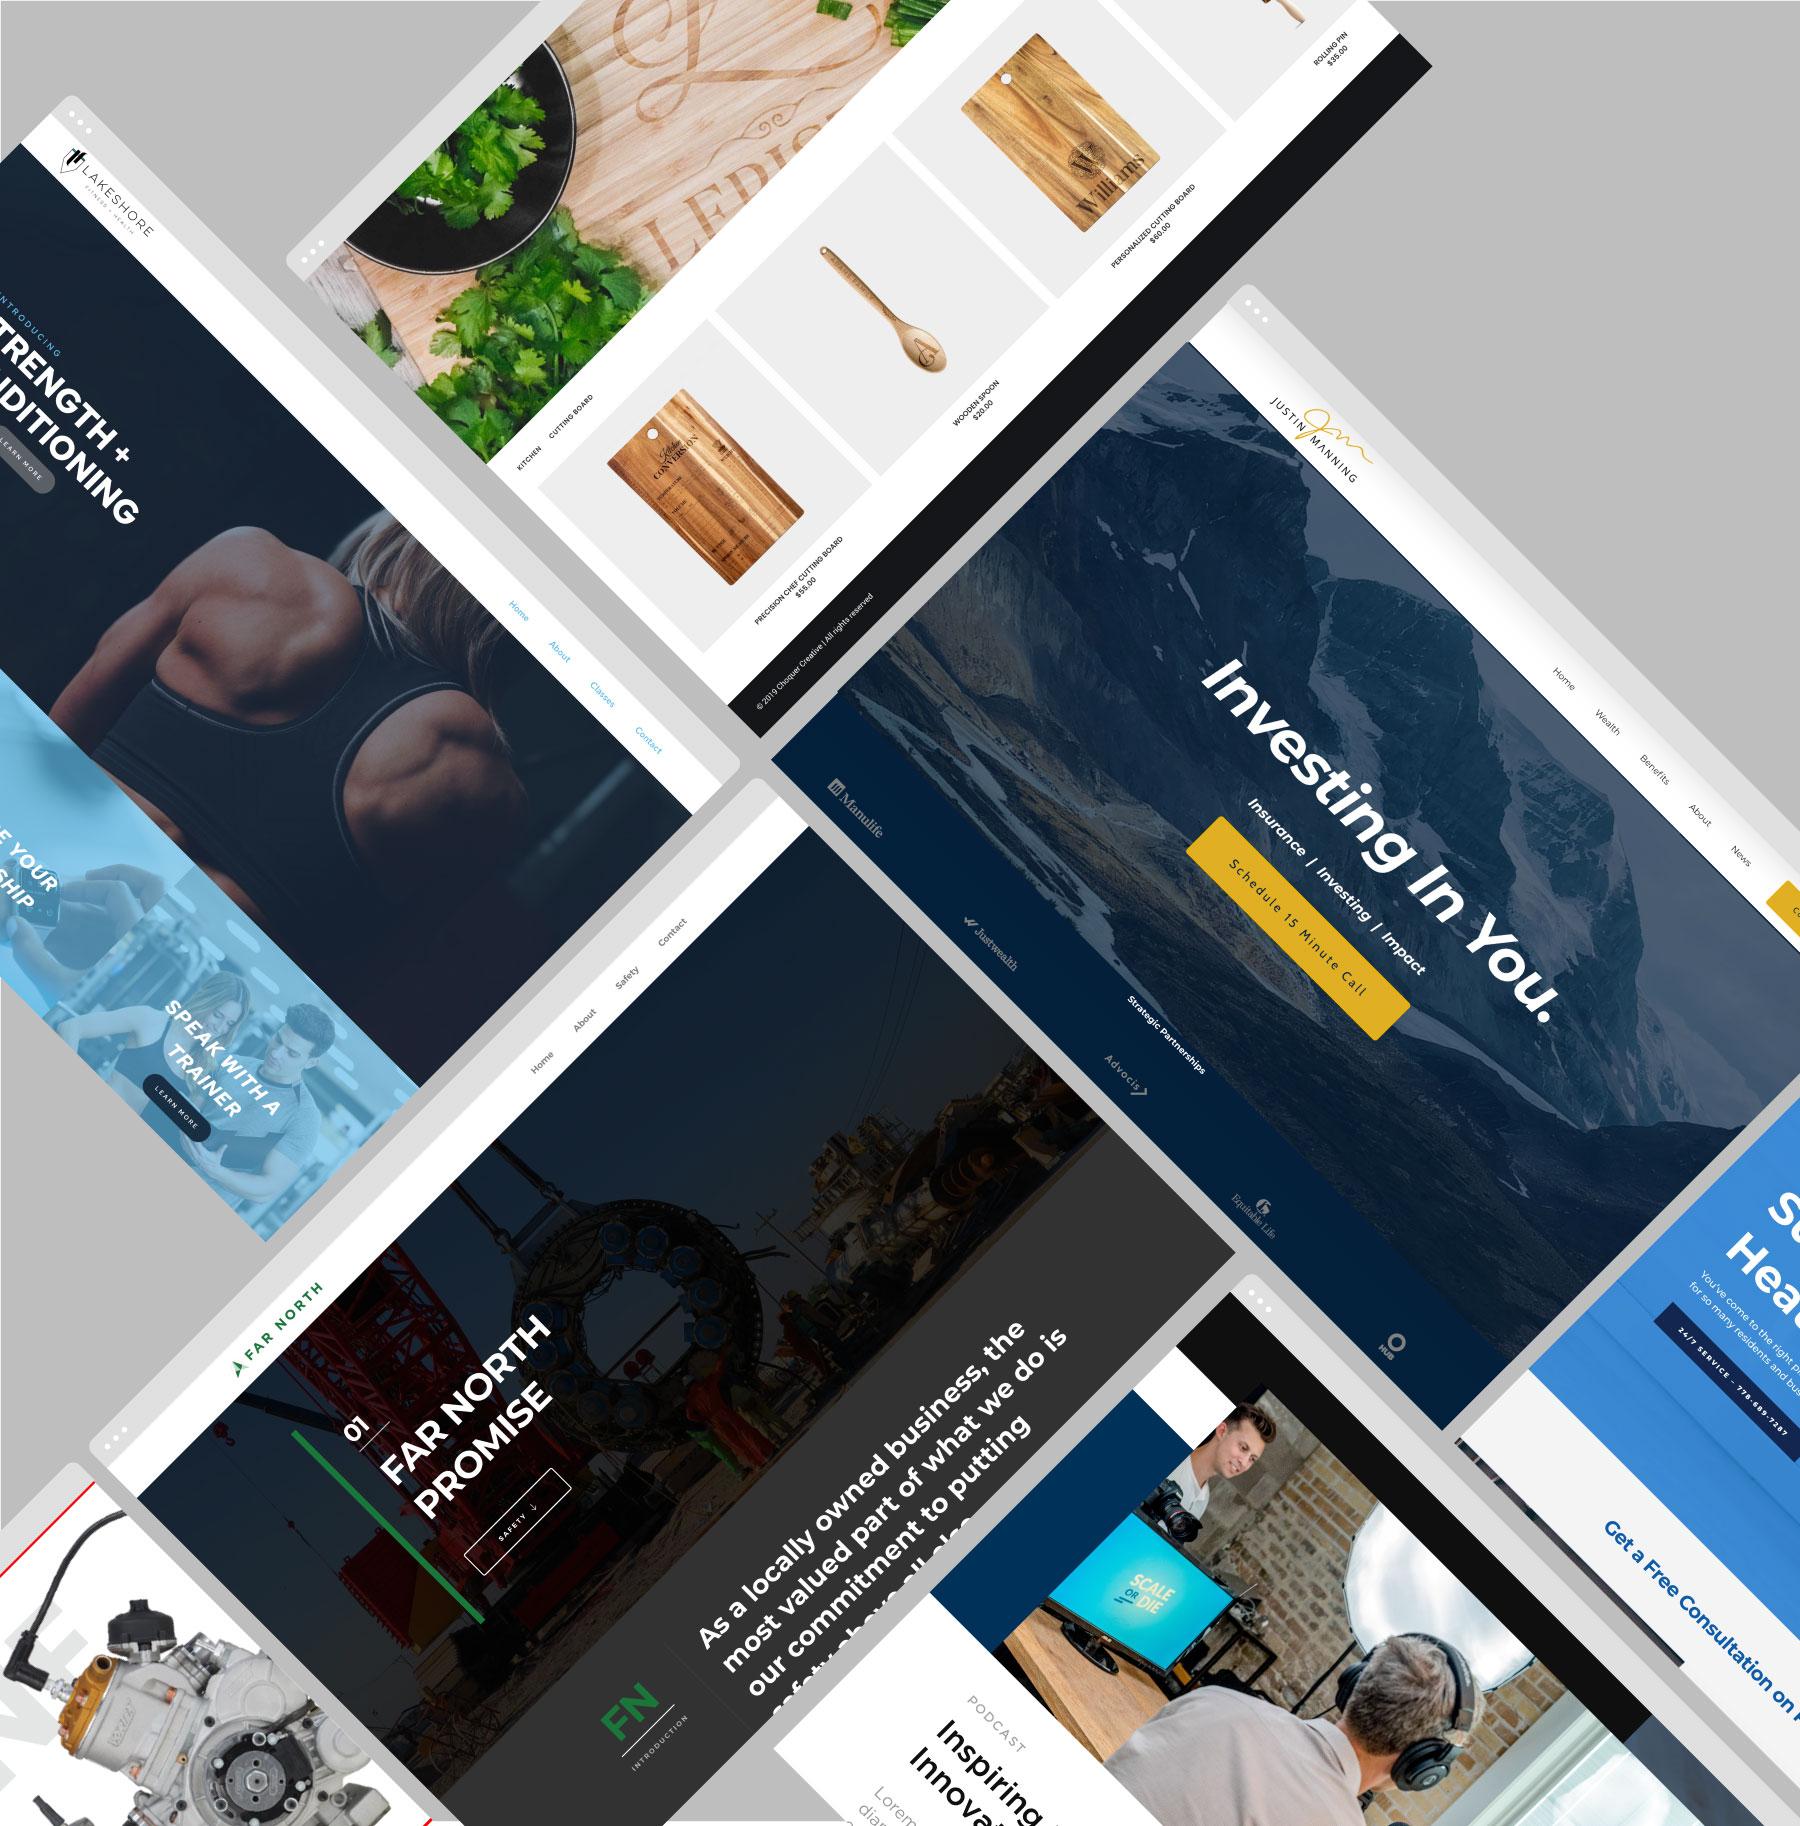 Wordpress Website Designers Surrey BC, Wix Alternative Websites